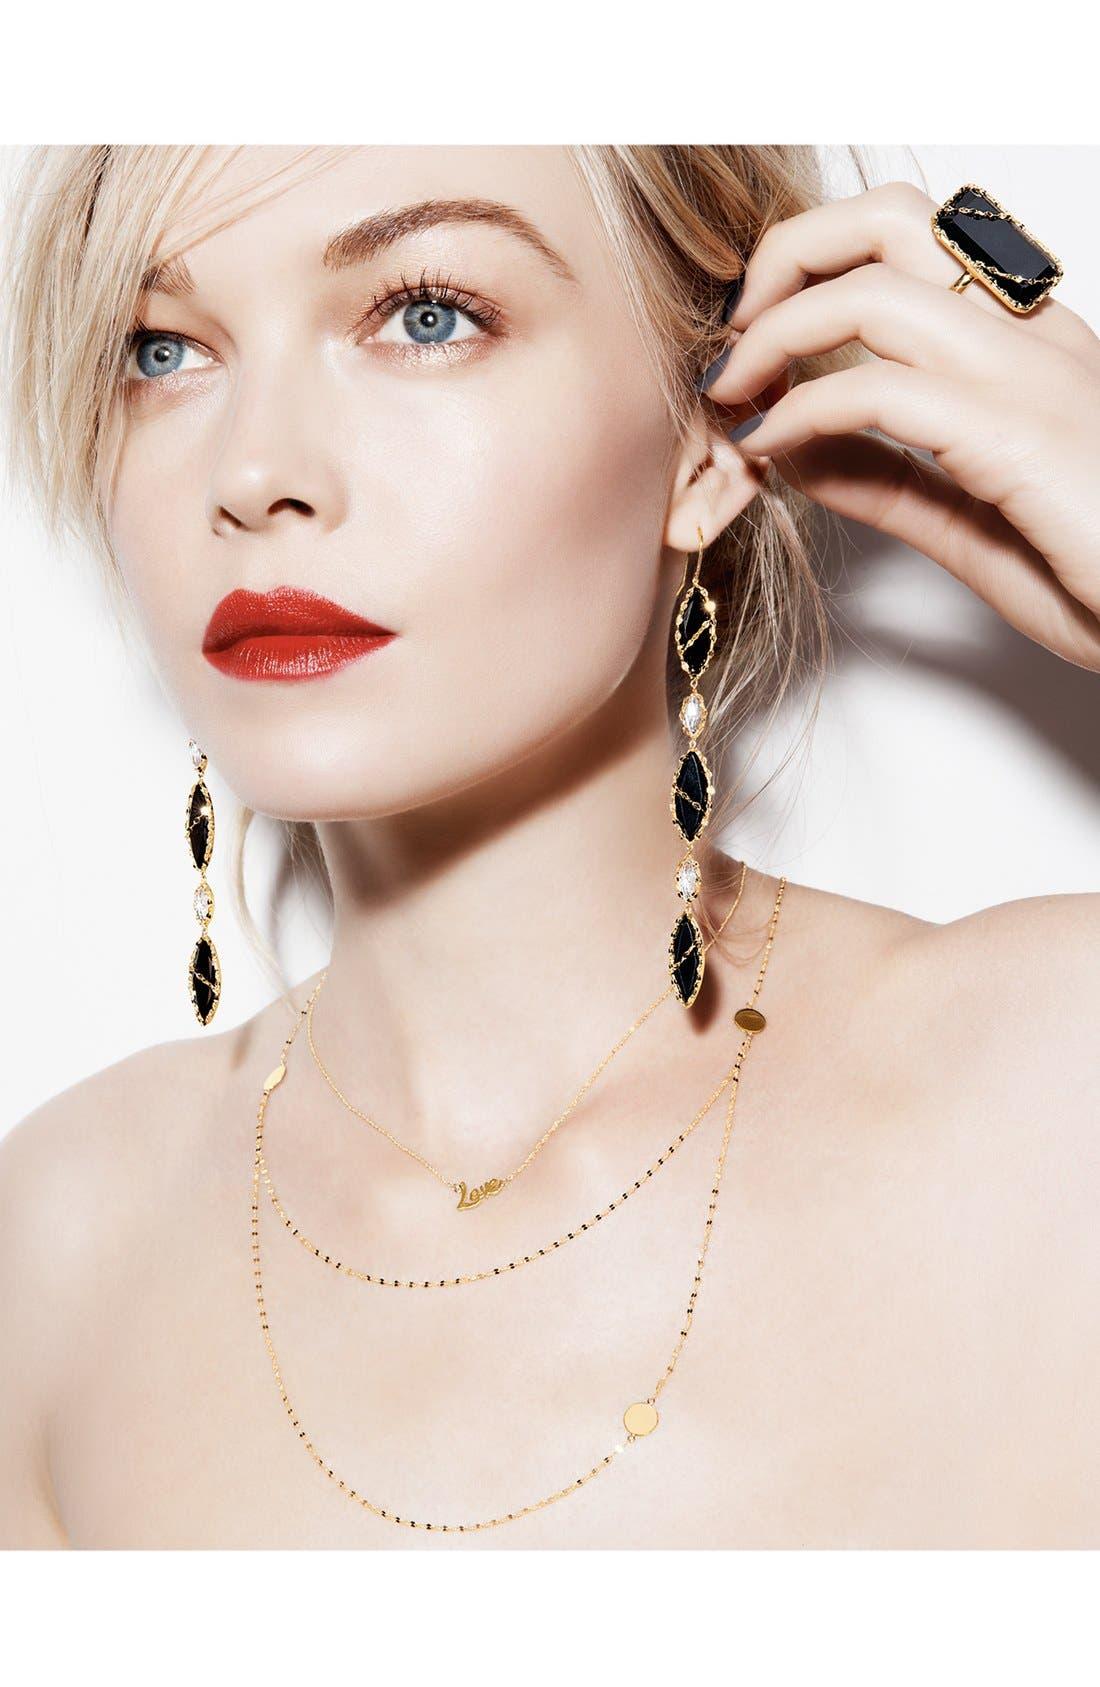 Alternate Image 3  - Lana Jewelry 'Spellbound - Love' Pendant Necklace